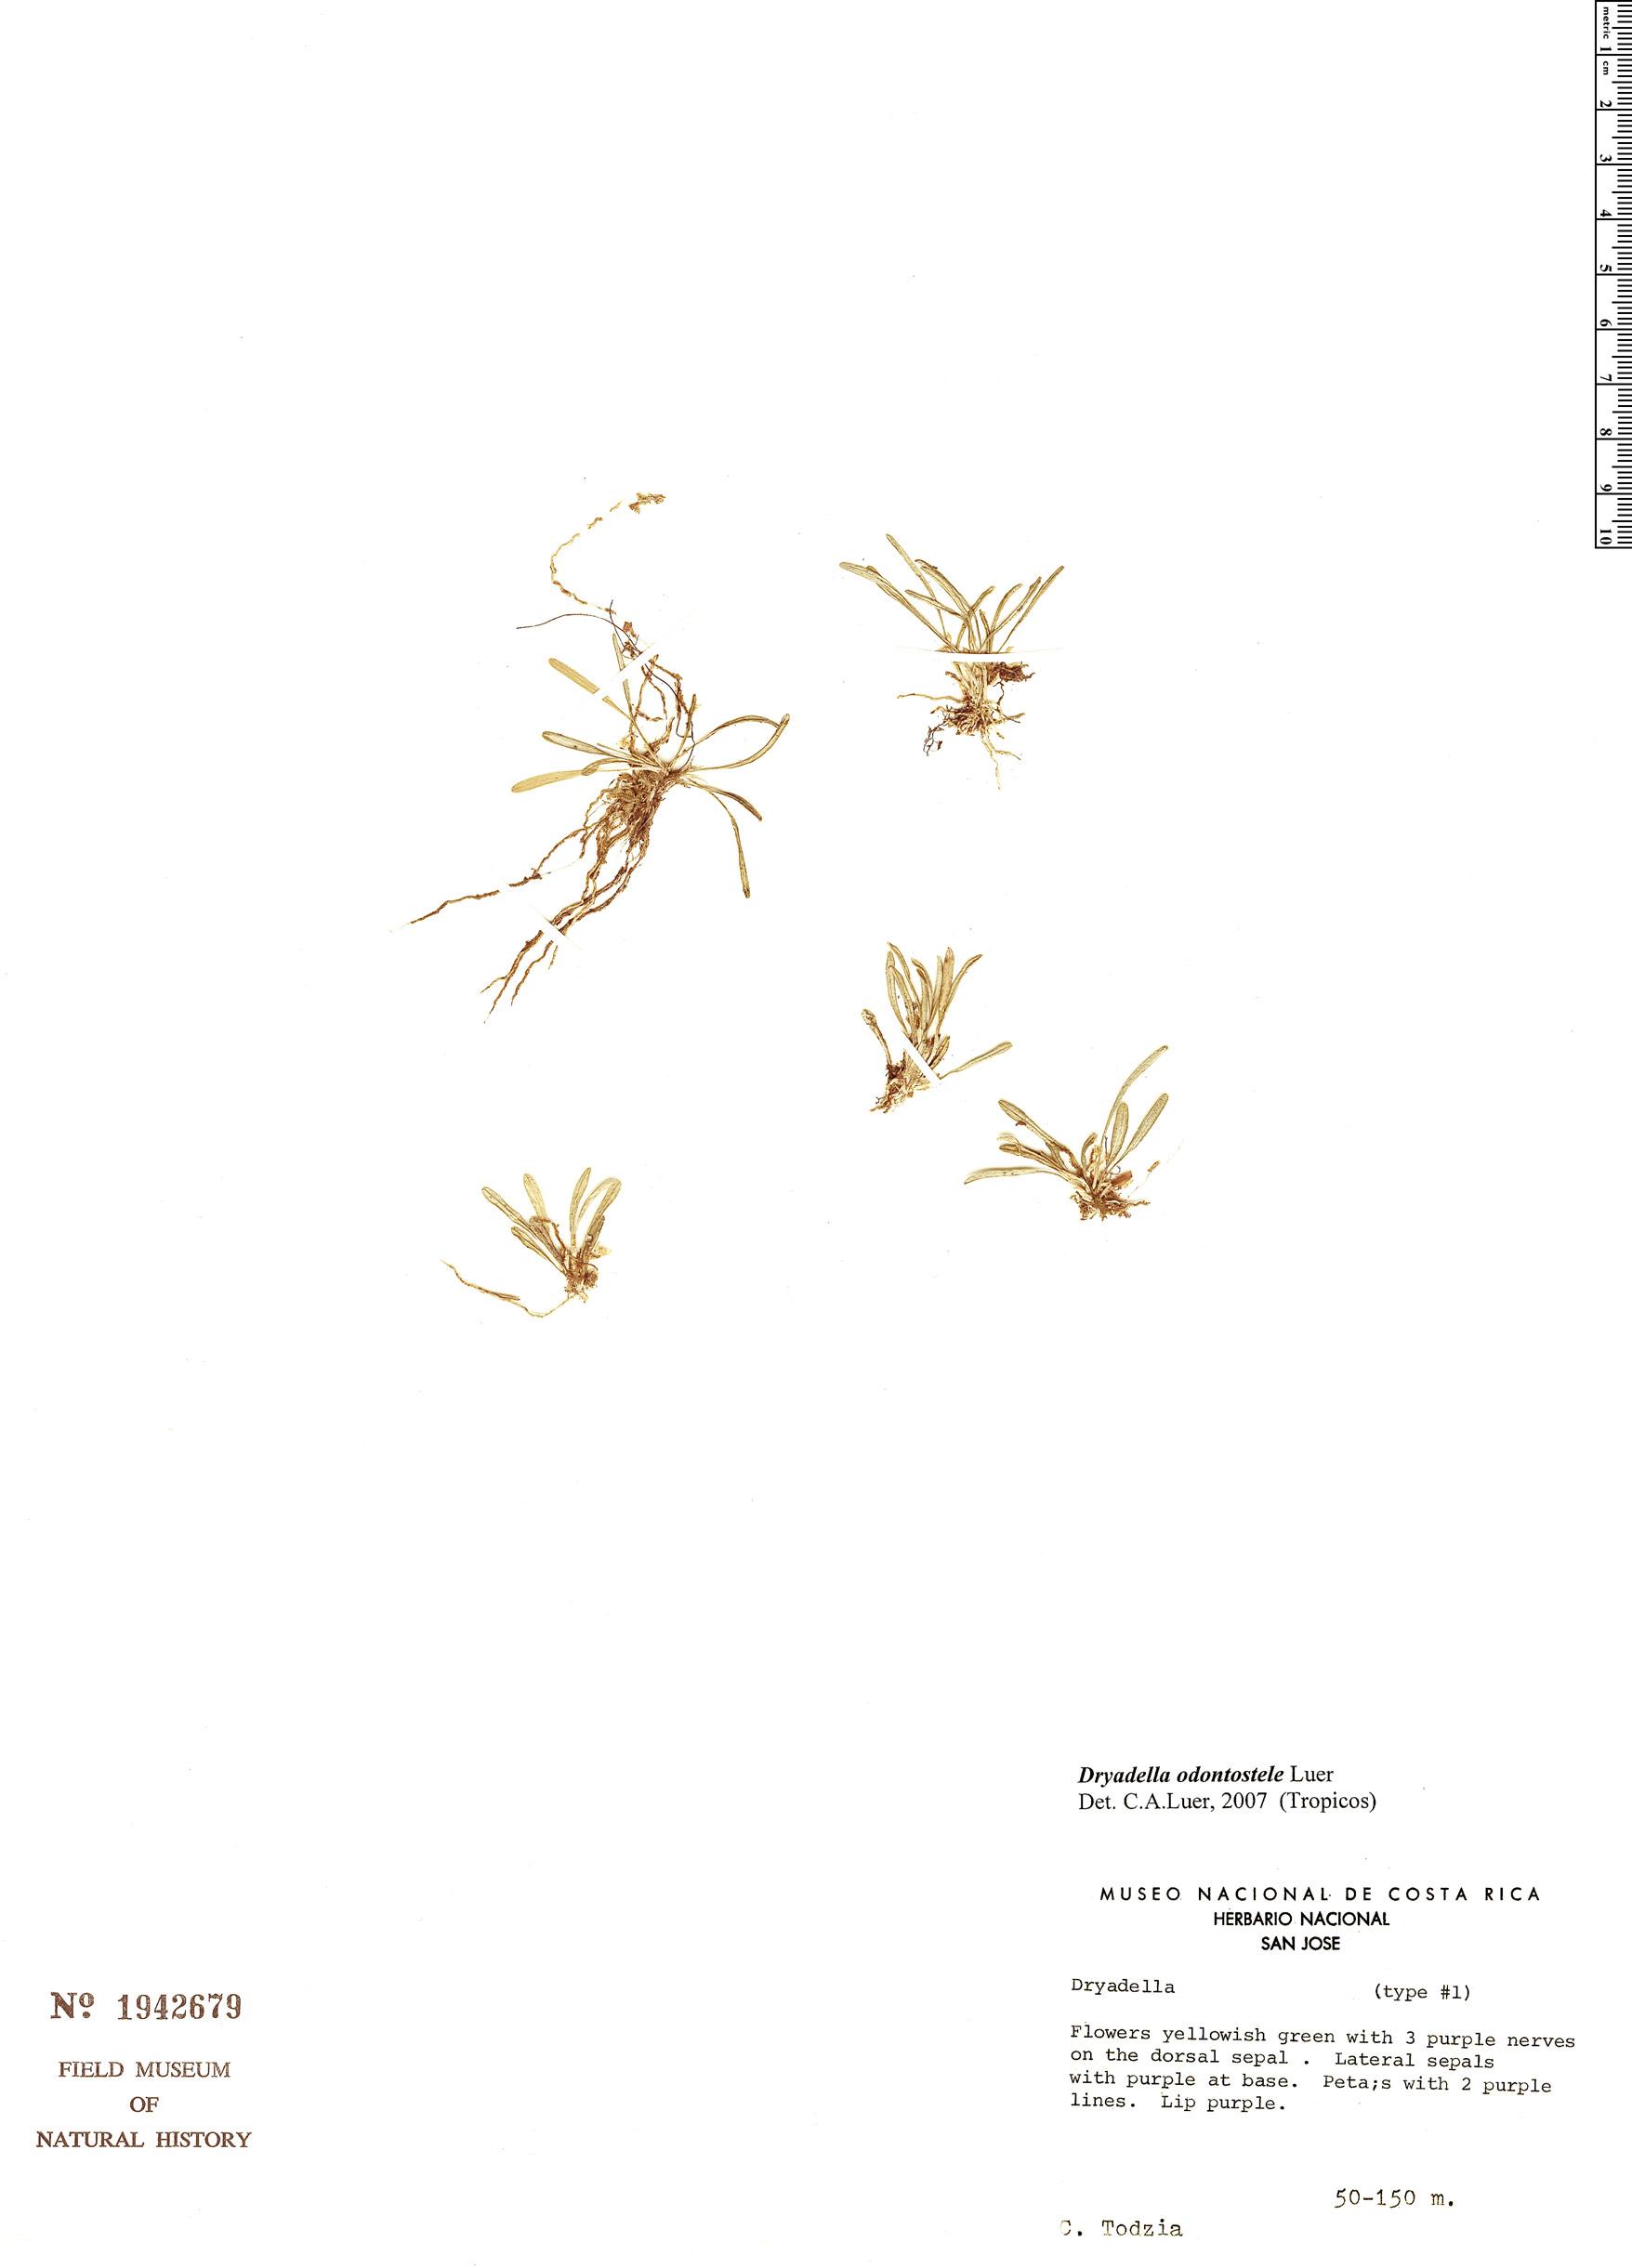 Specimen: Dryadella odontostele